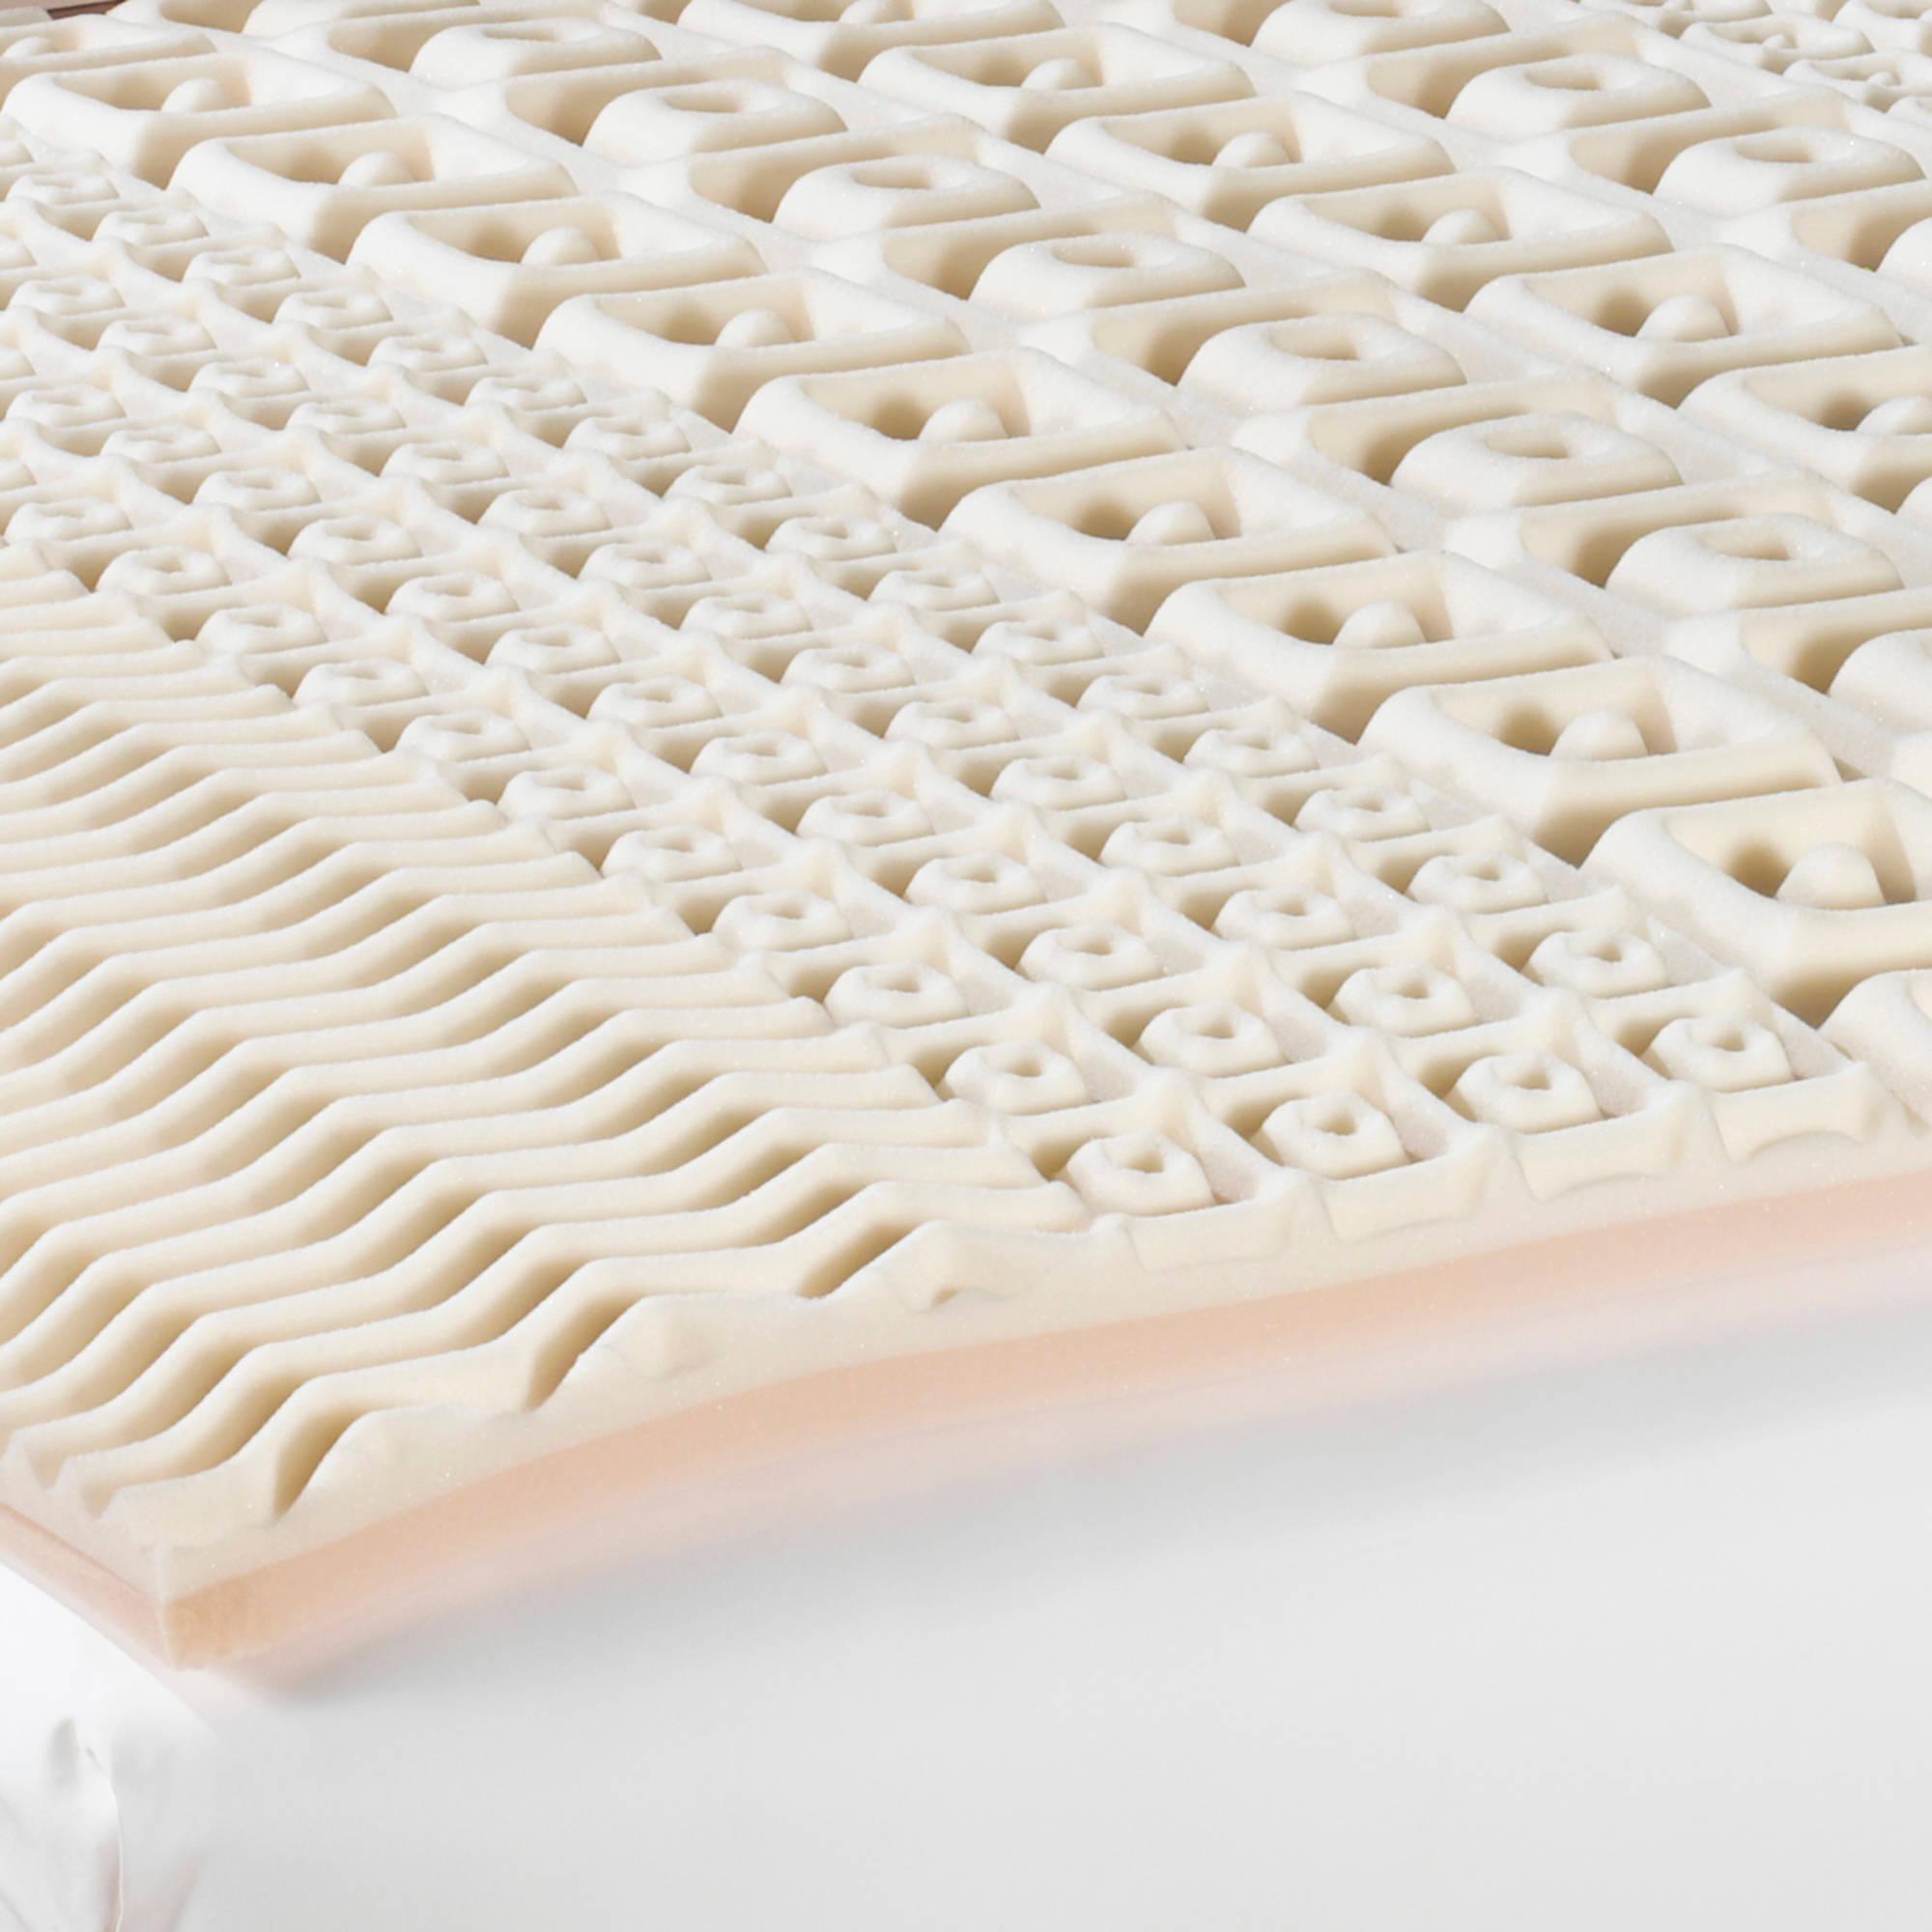 Beautyrest 5-Zone 2.5 inch Contour Memory Foam Topper,Multiple Sizes